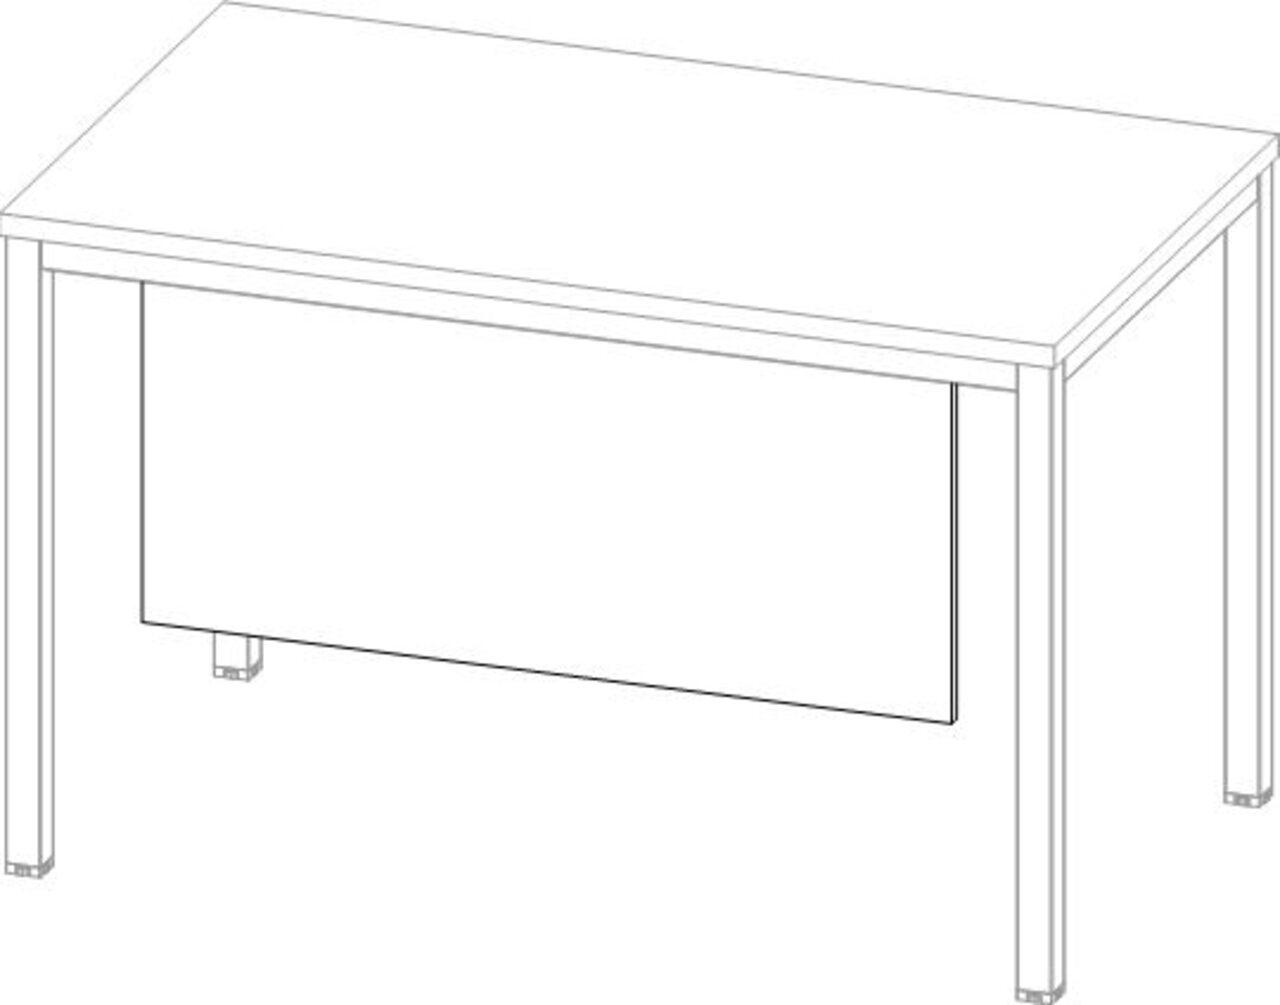 Царга к столу - фото 5